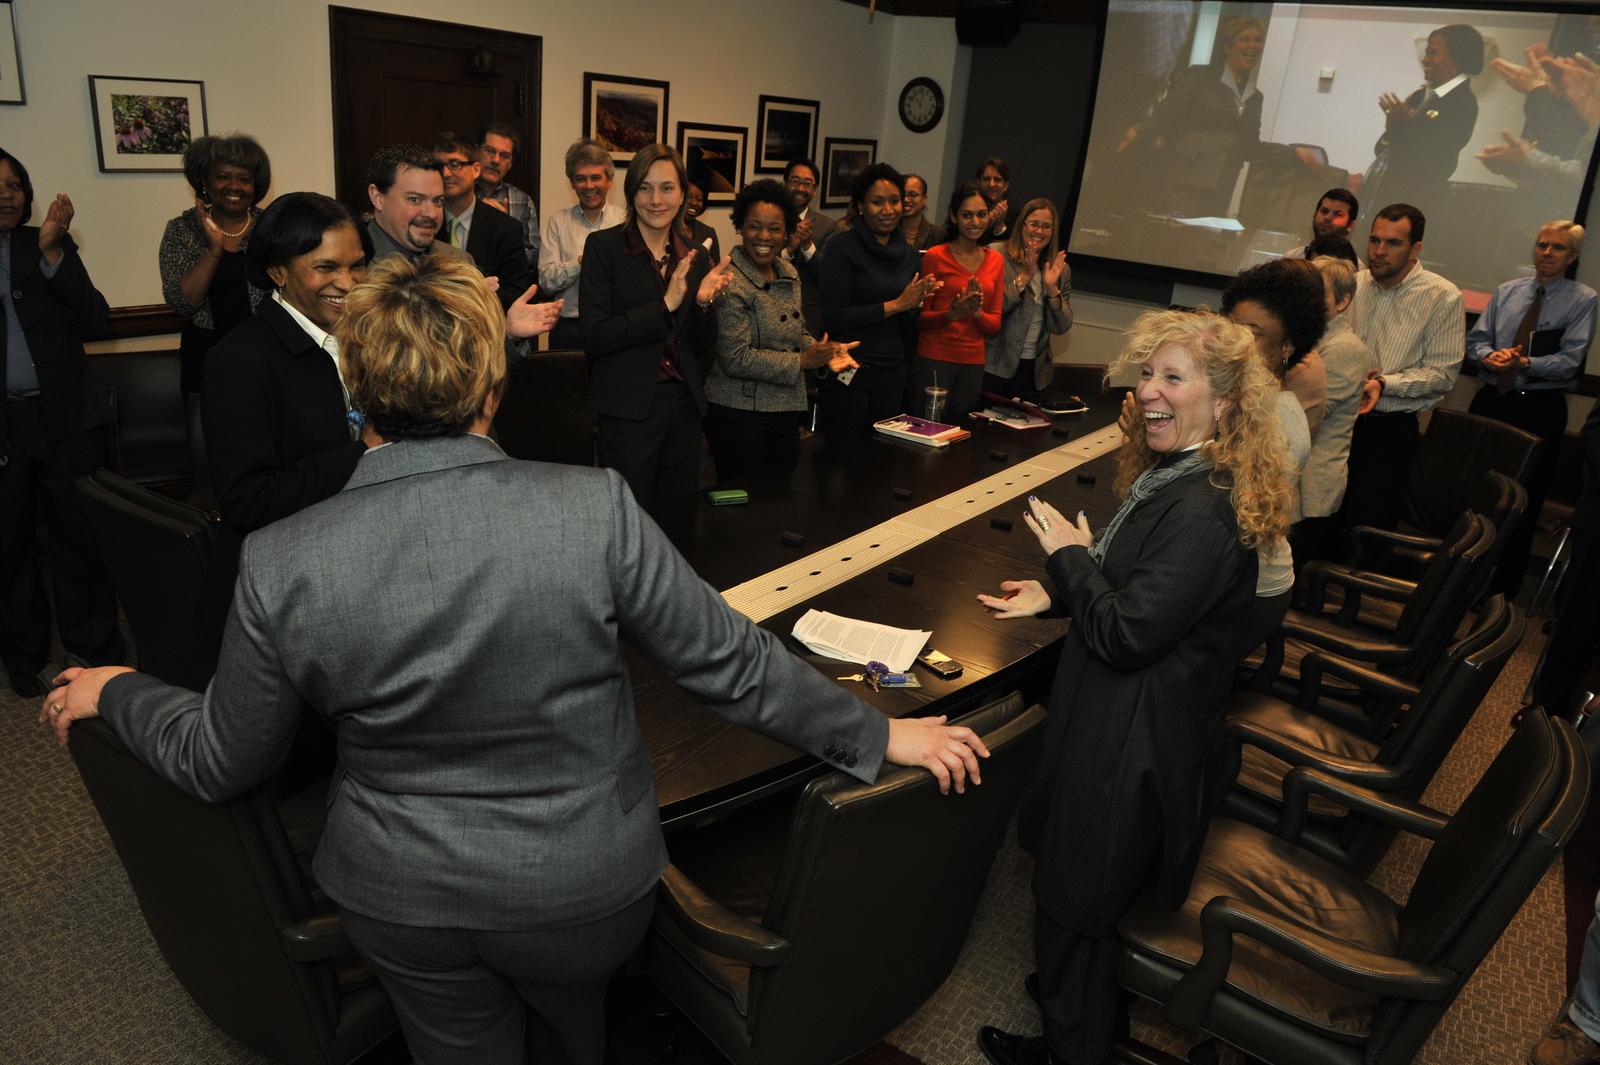 Office of the Administrator - Lisa Jackson's Farewell Tour [412-APD-1115-2013-02-07_FarewellTour_184.JPG]